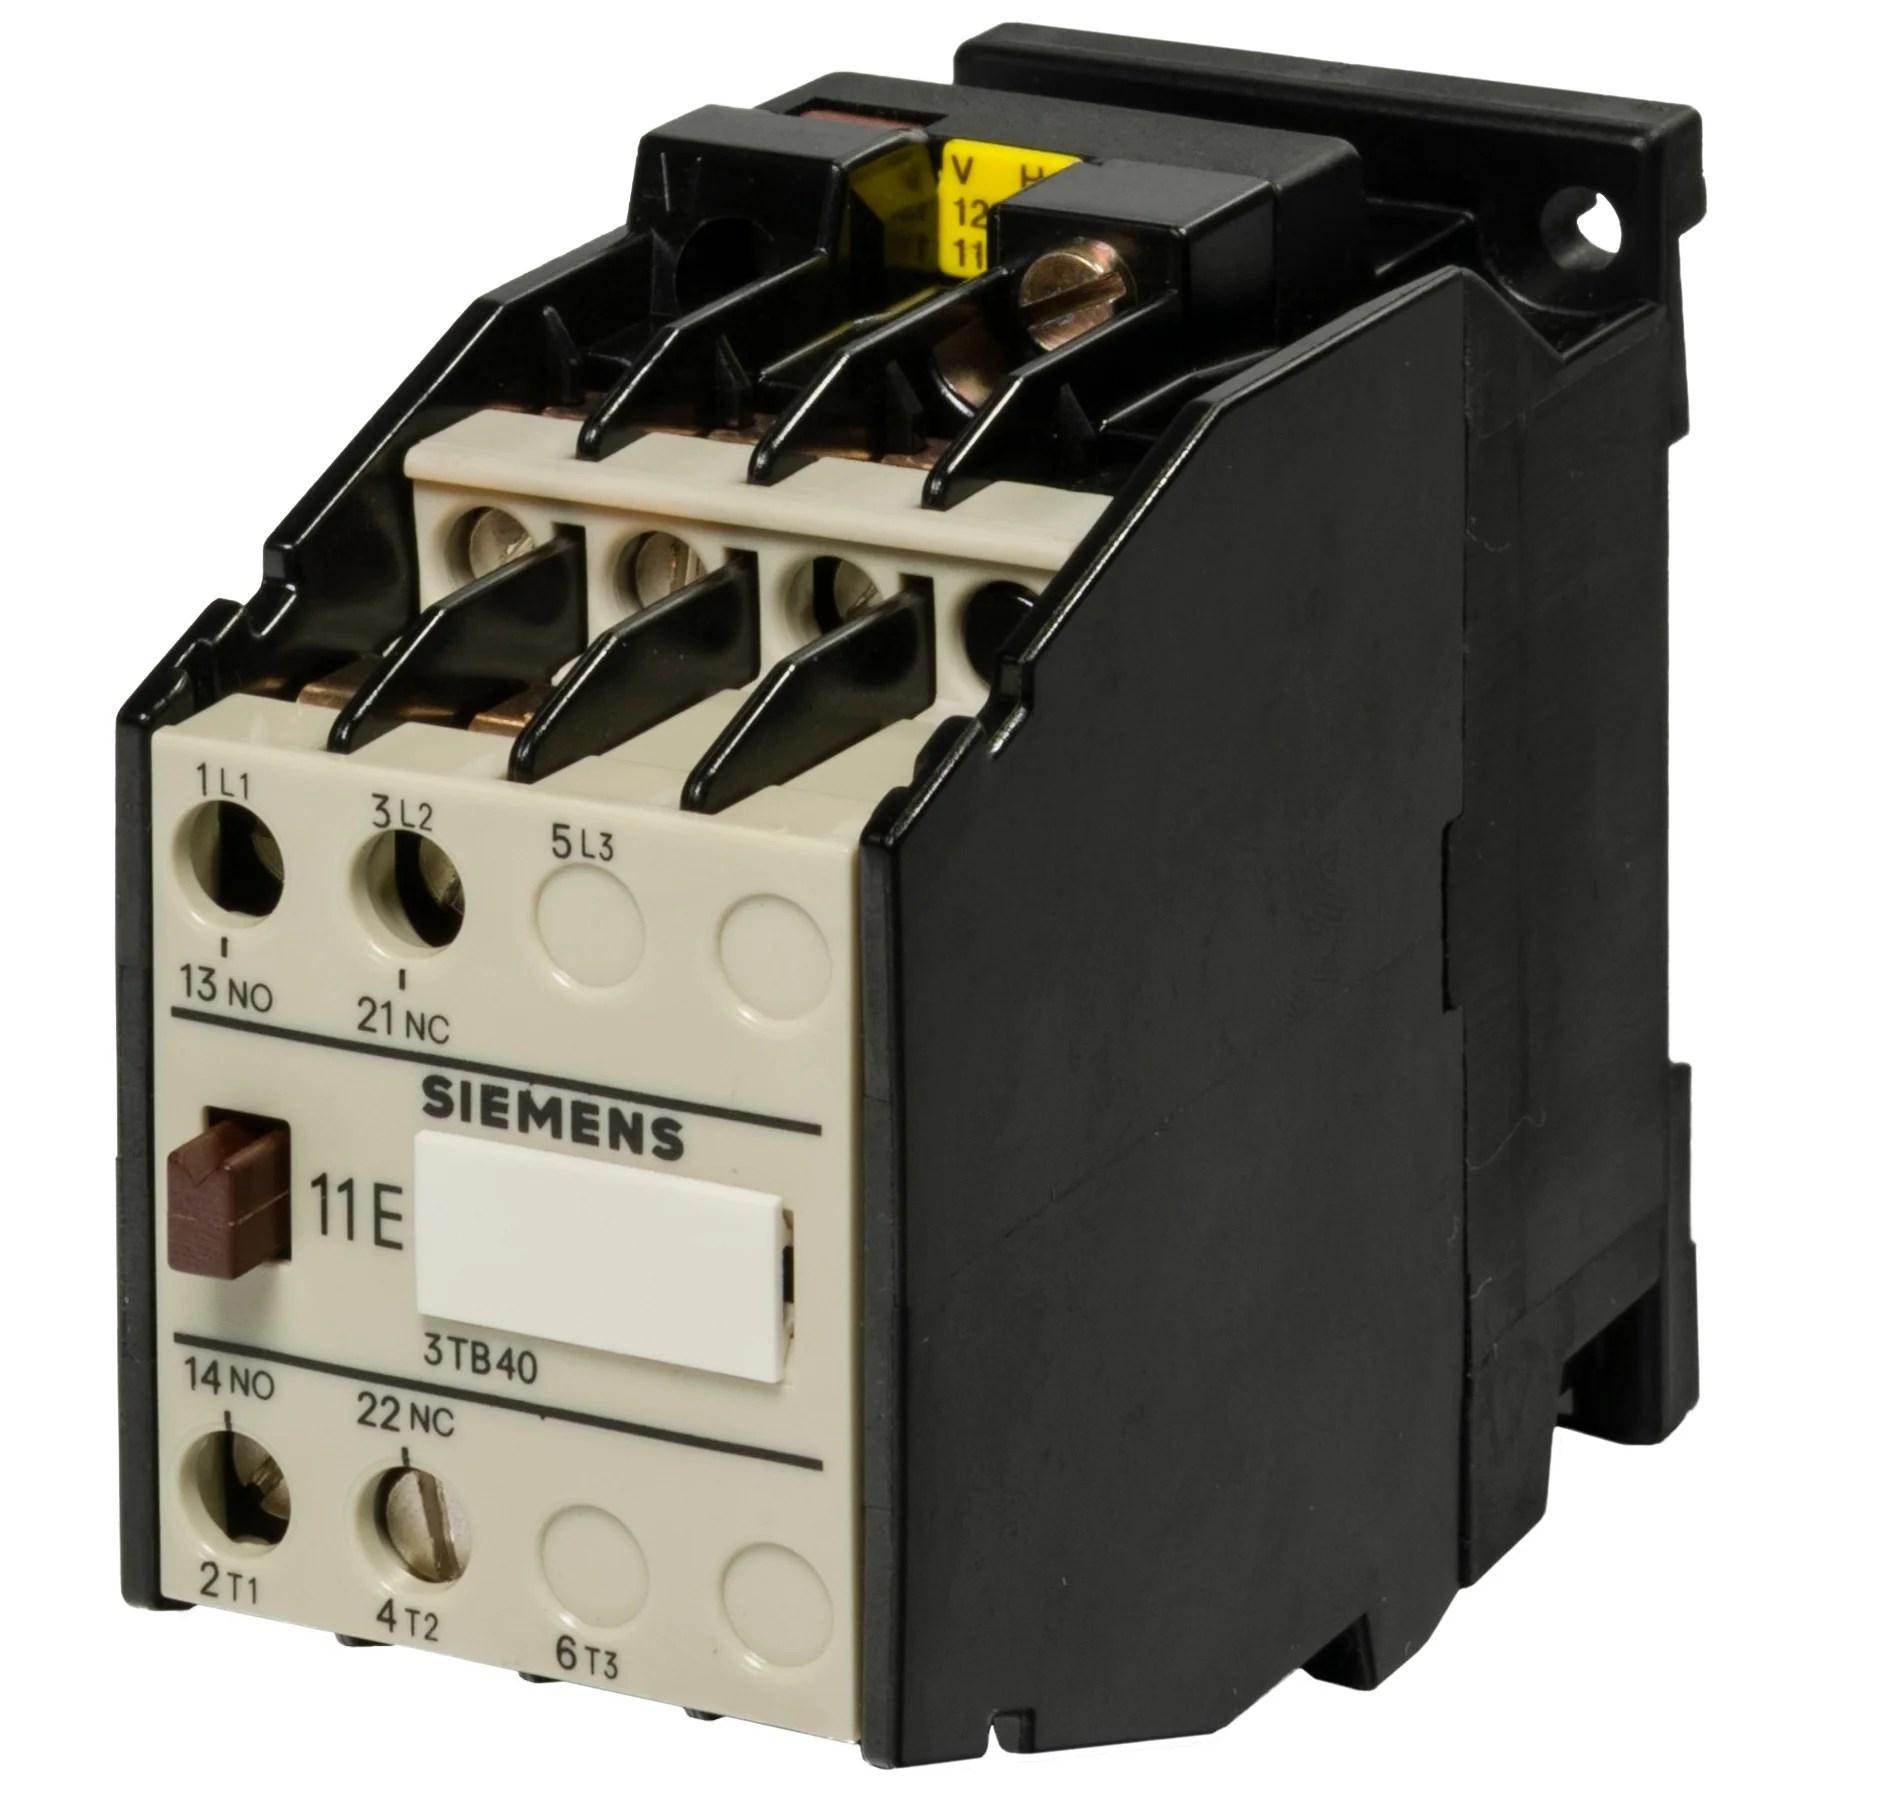 hight resolution of siemens motor starter contactors series 3tb